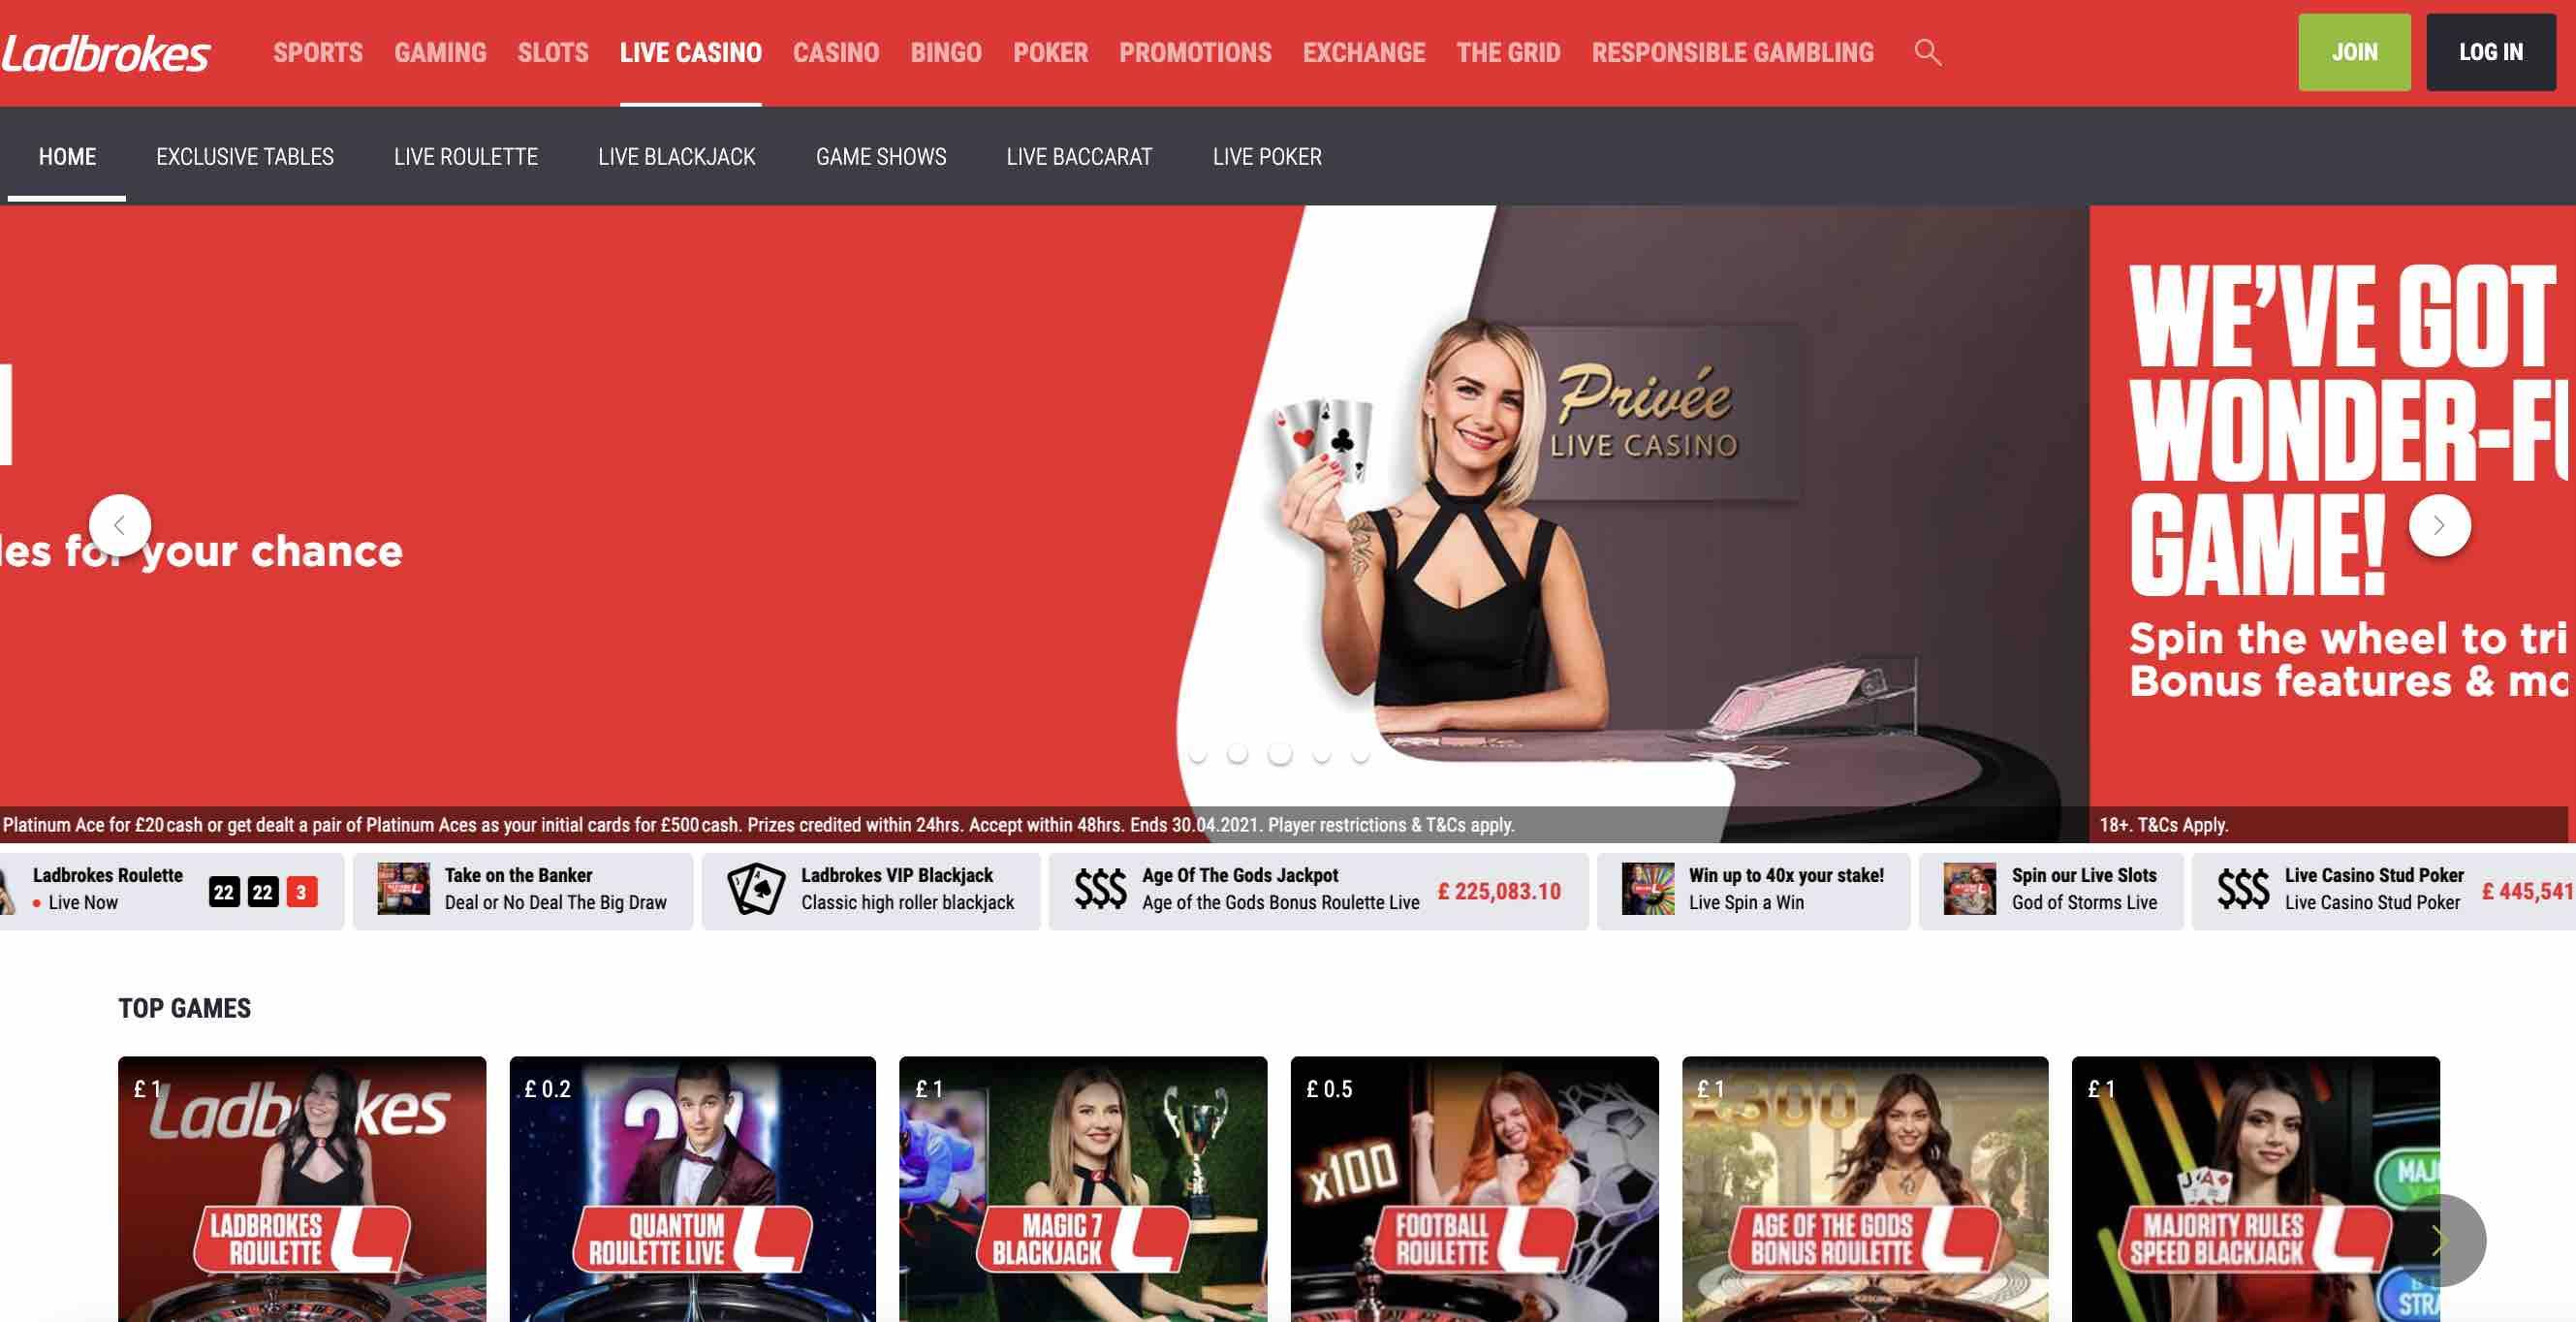 Live Casino Games at Ladbrokes Casino